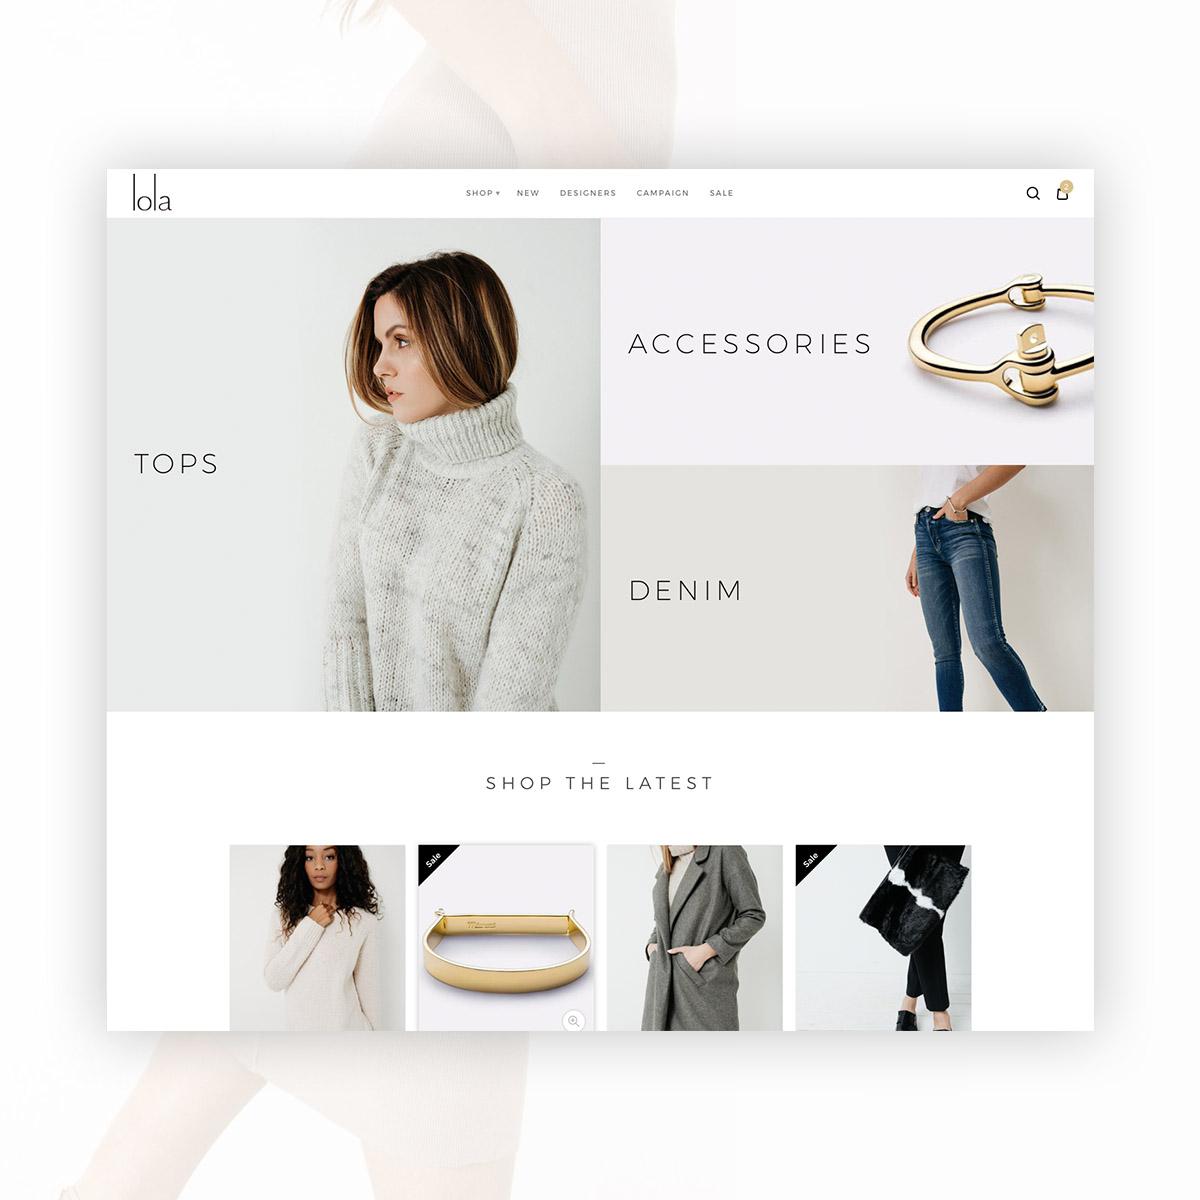 lola boutique desktop website design